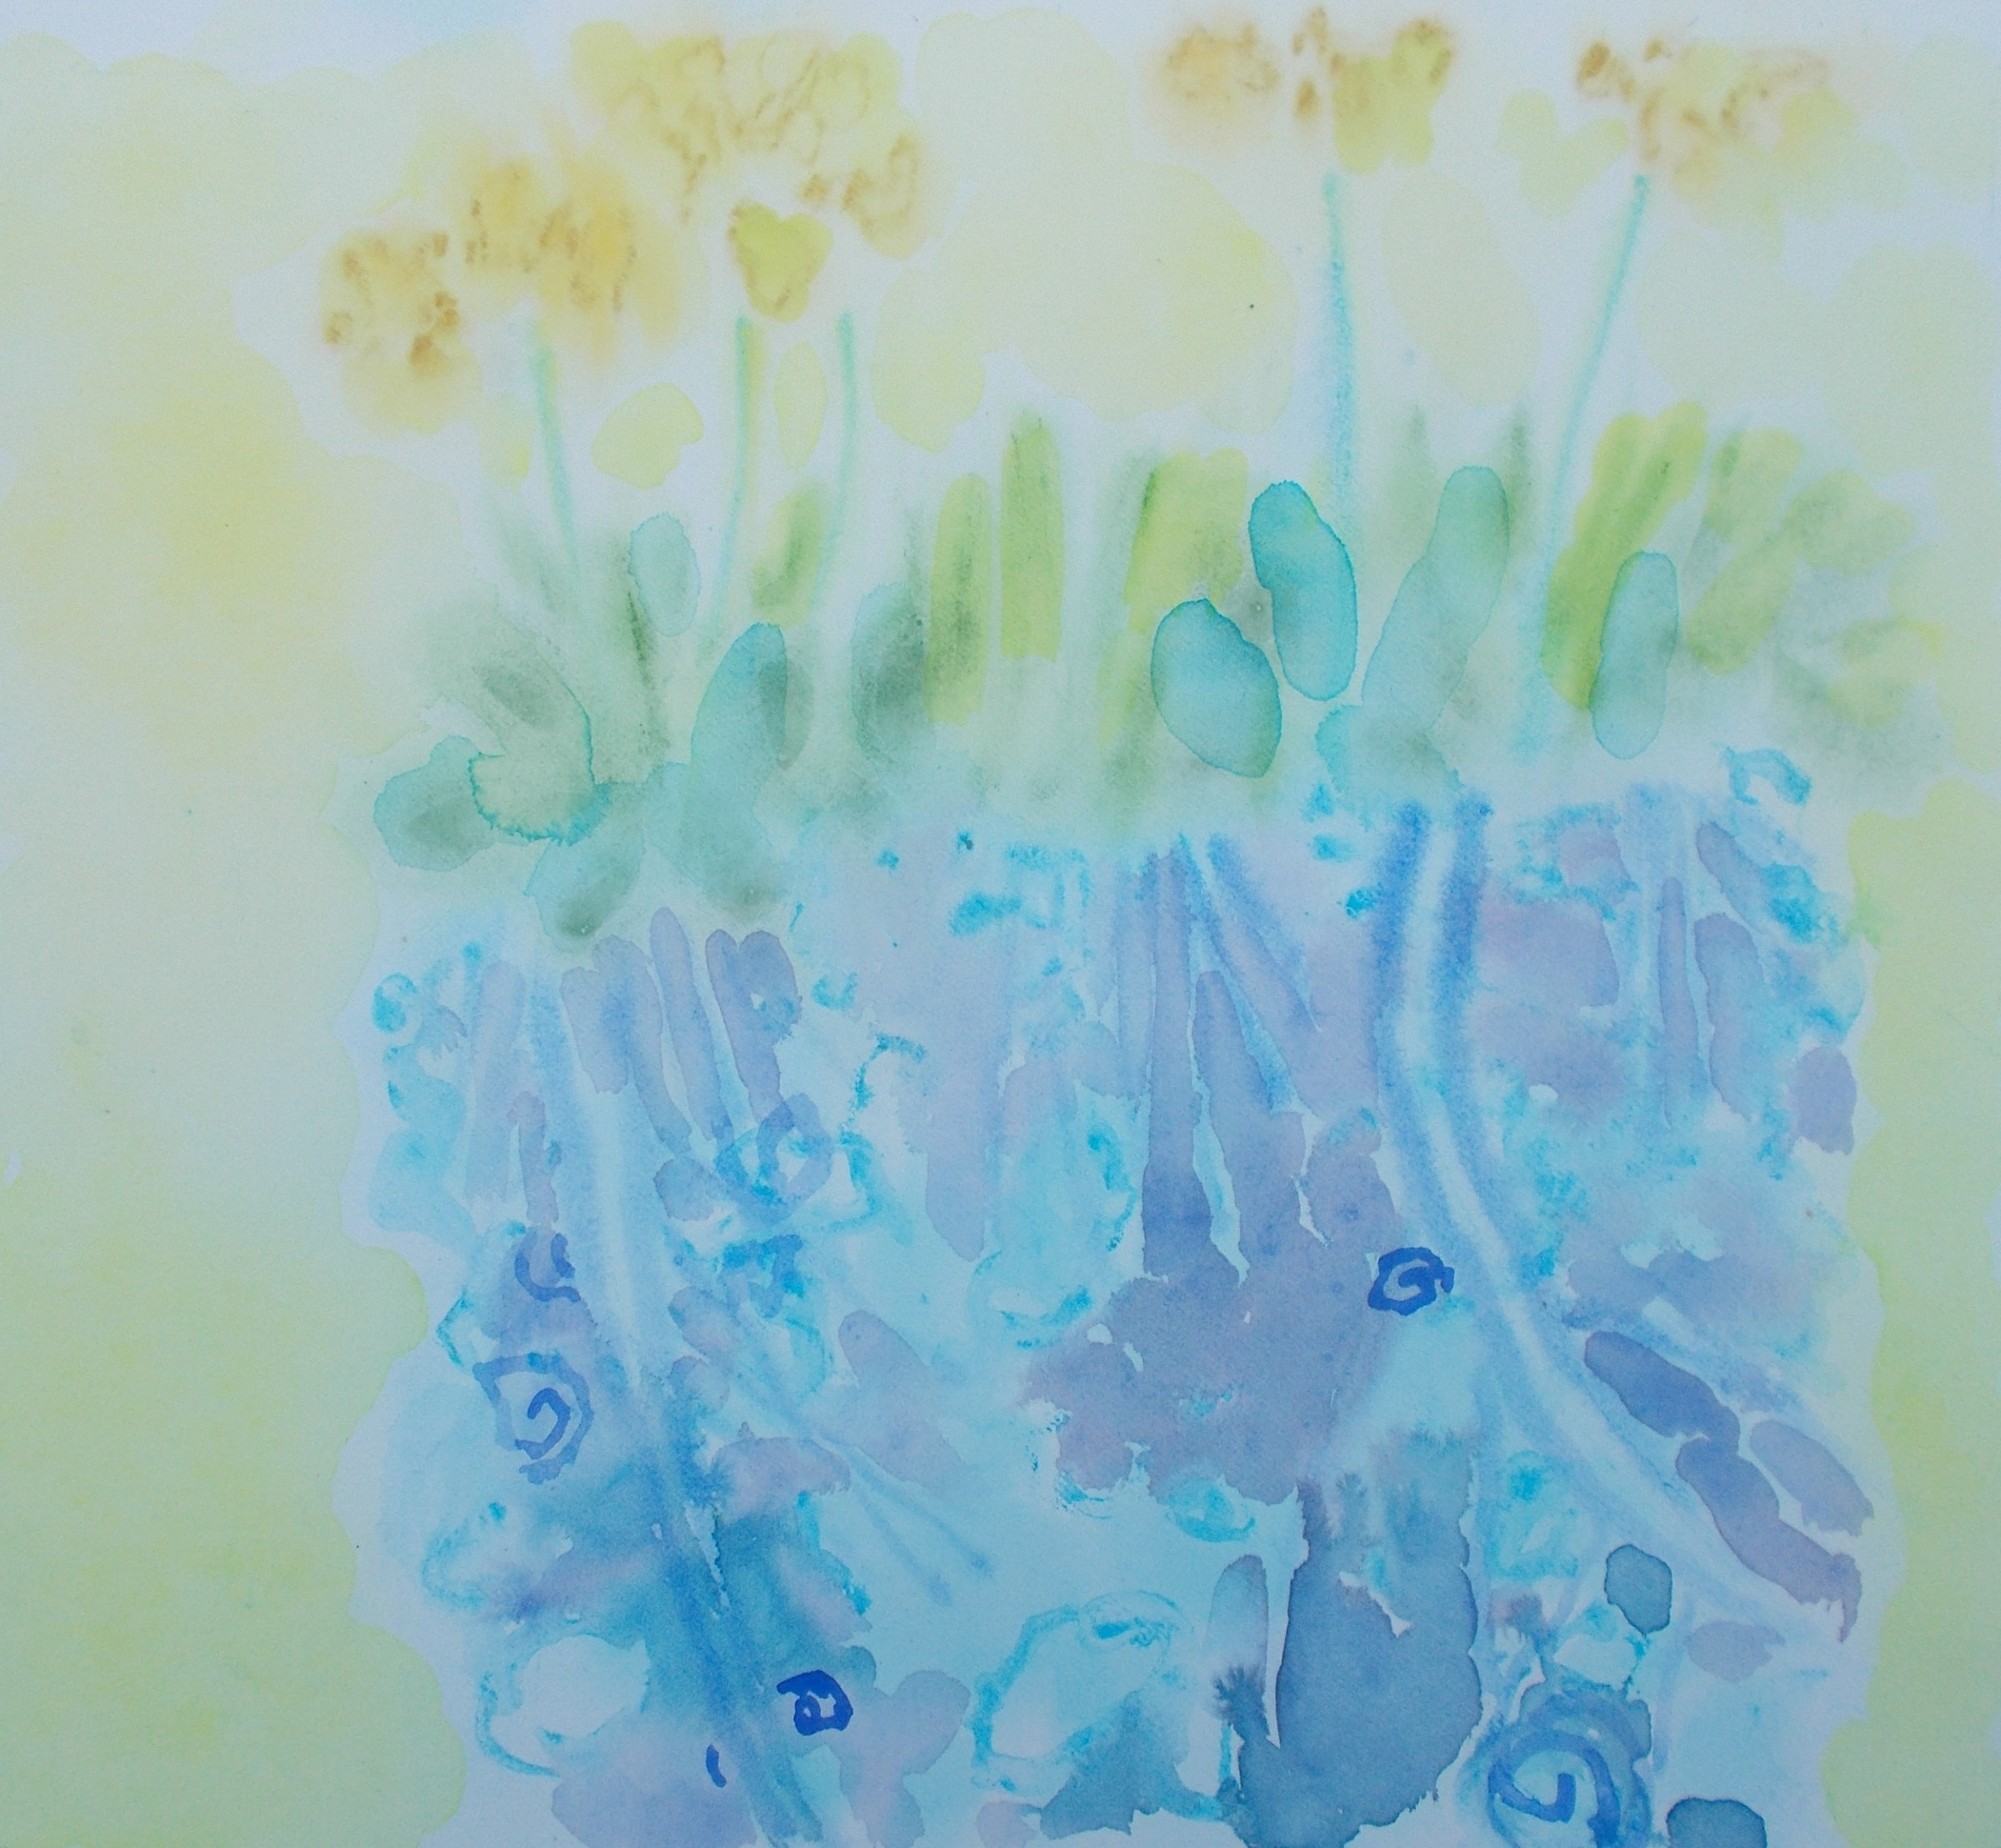 "<span class=""link fancybox-details-link""><a href=""/artists/80-anne-marlow/works/12412-anne-marlow-field-flowers/"">View Detail Page</a></span><div class=""artist""><span class=""artist""><strong>Anne Marlow</strong></span></div><div class=""title""><em>Field Flowers</em></div><div class=""medium"">watercolour</div><div class=""dimensions"">Frame: 44 x 46.5 cm<br /> Artwork: 26 x 29 cm</div><div class=""price"">£275.00</div>"